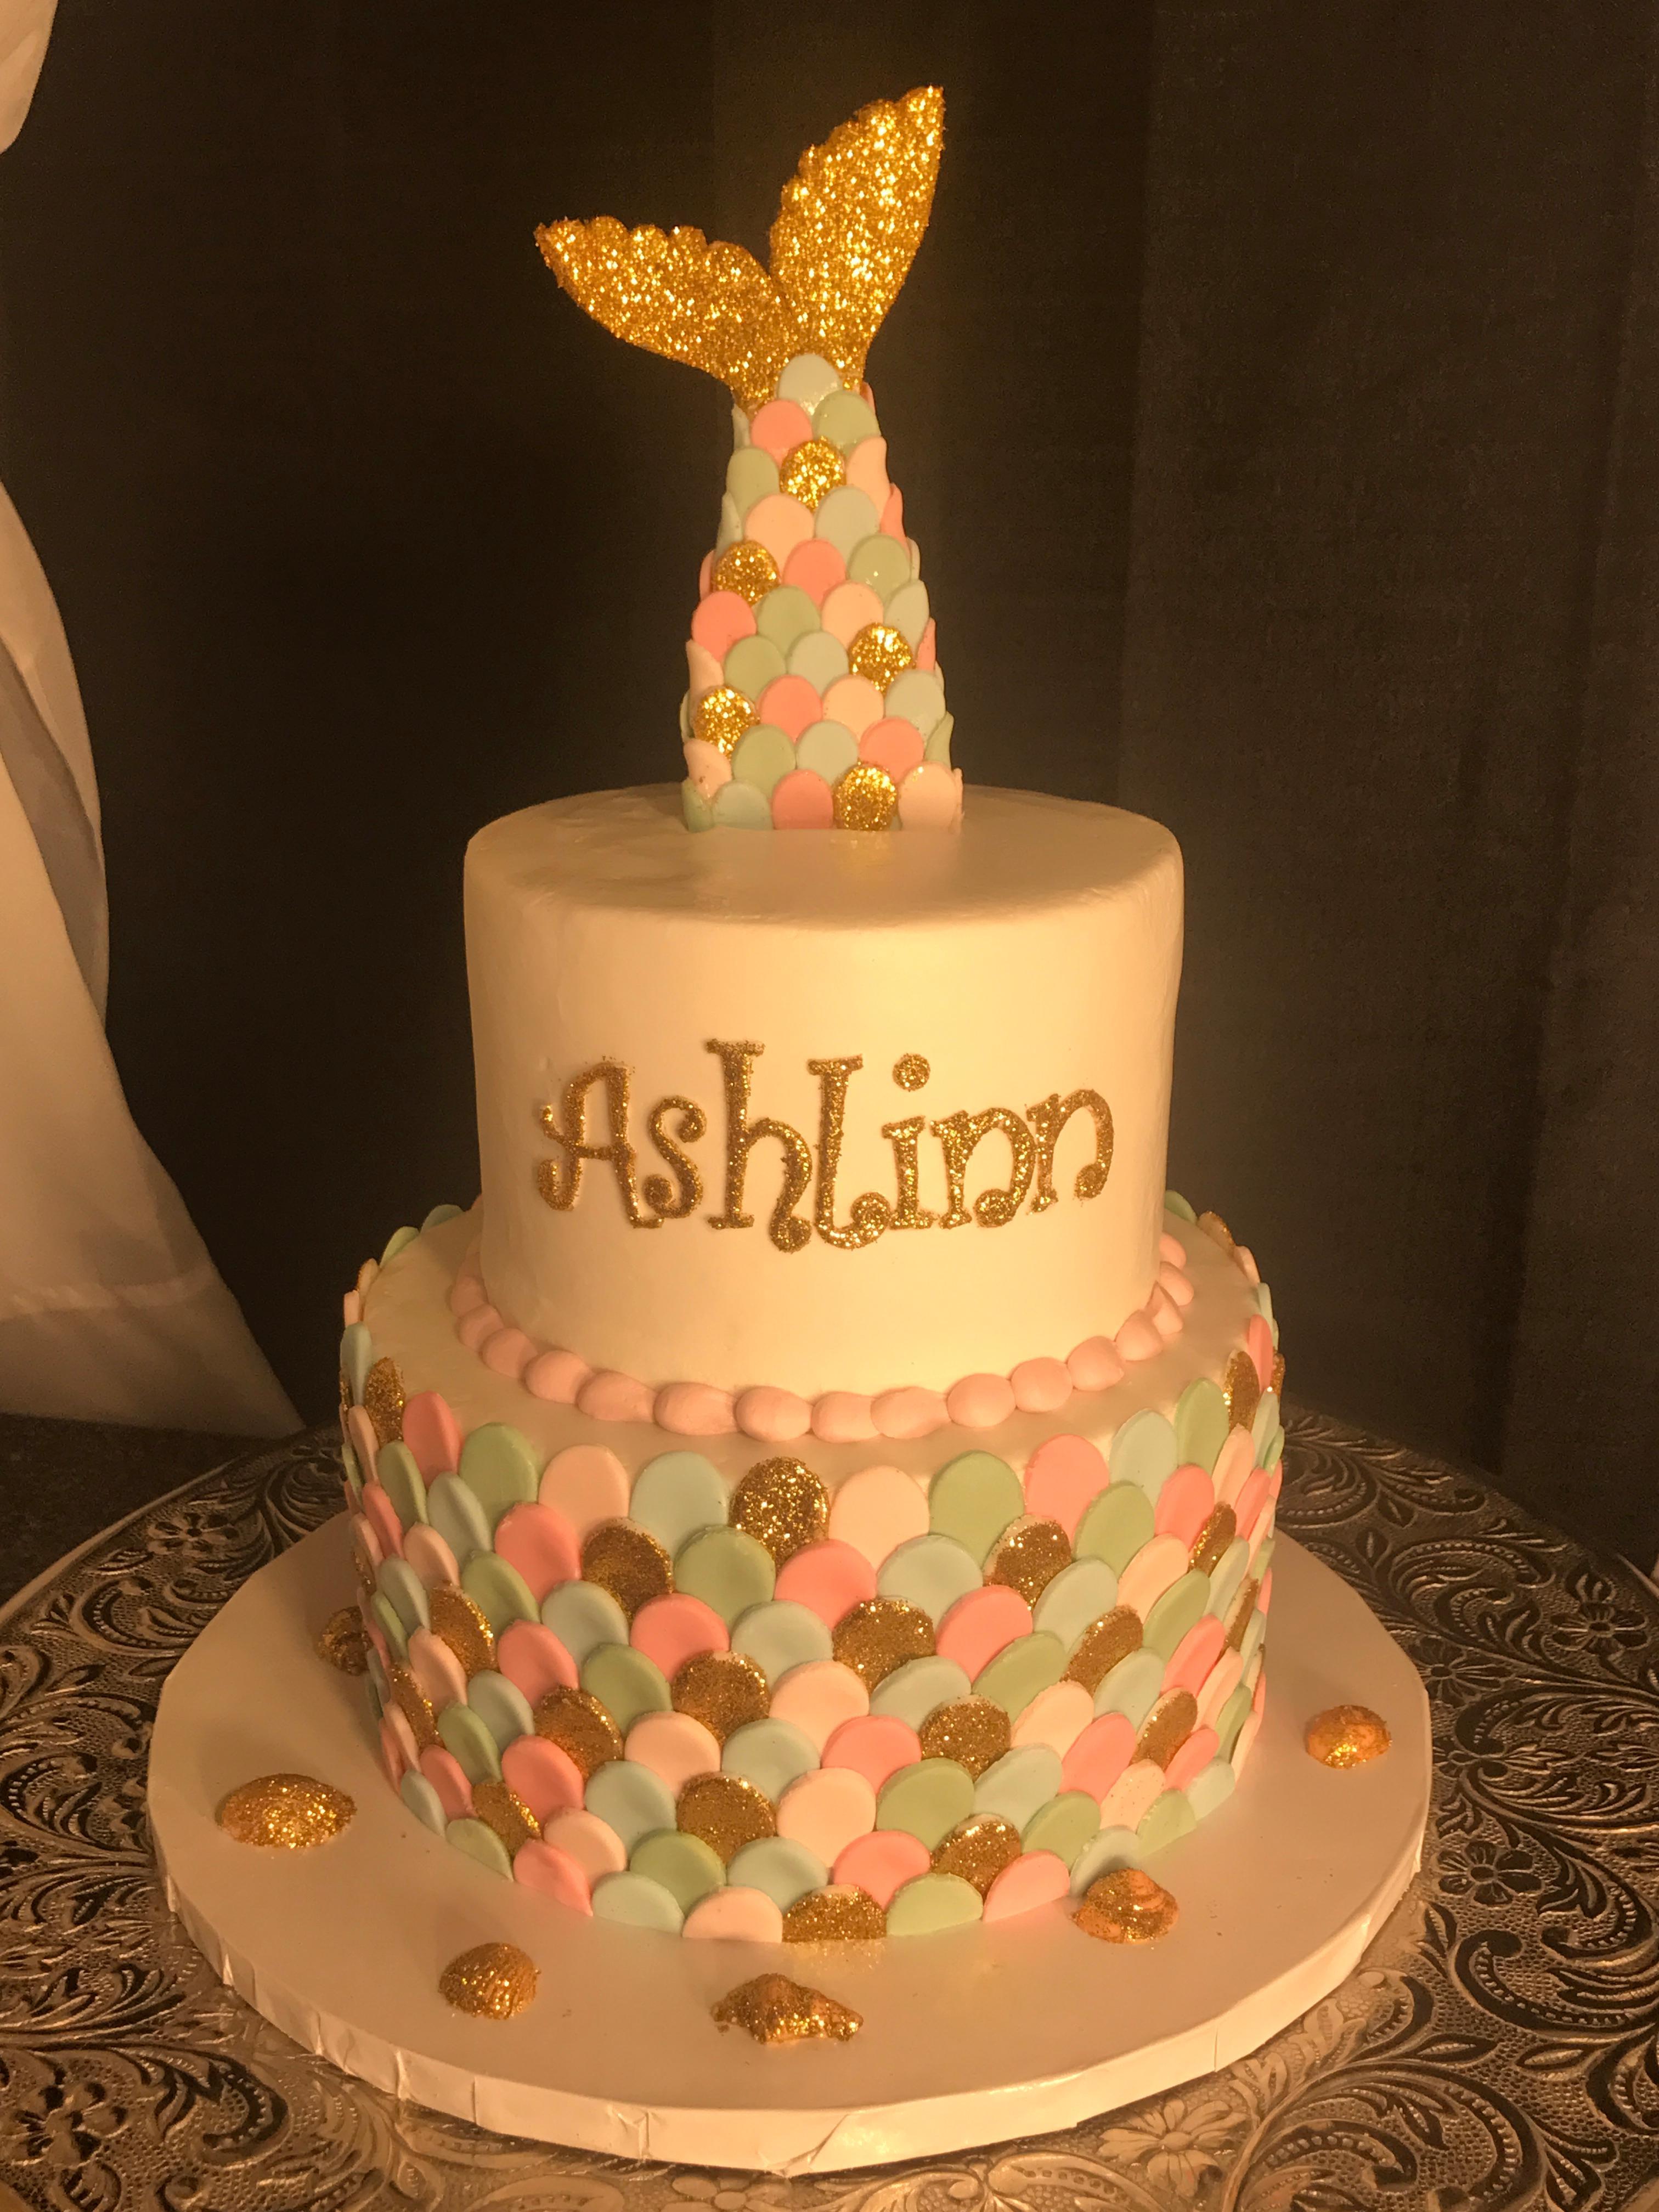 Cake Bakery Edwardsville Il